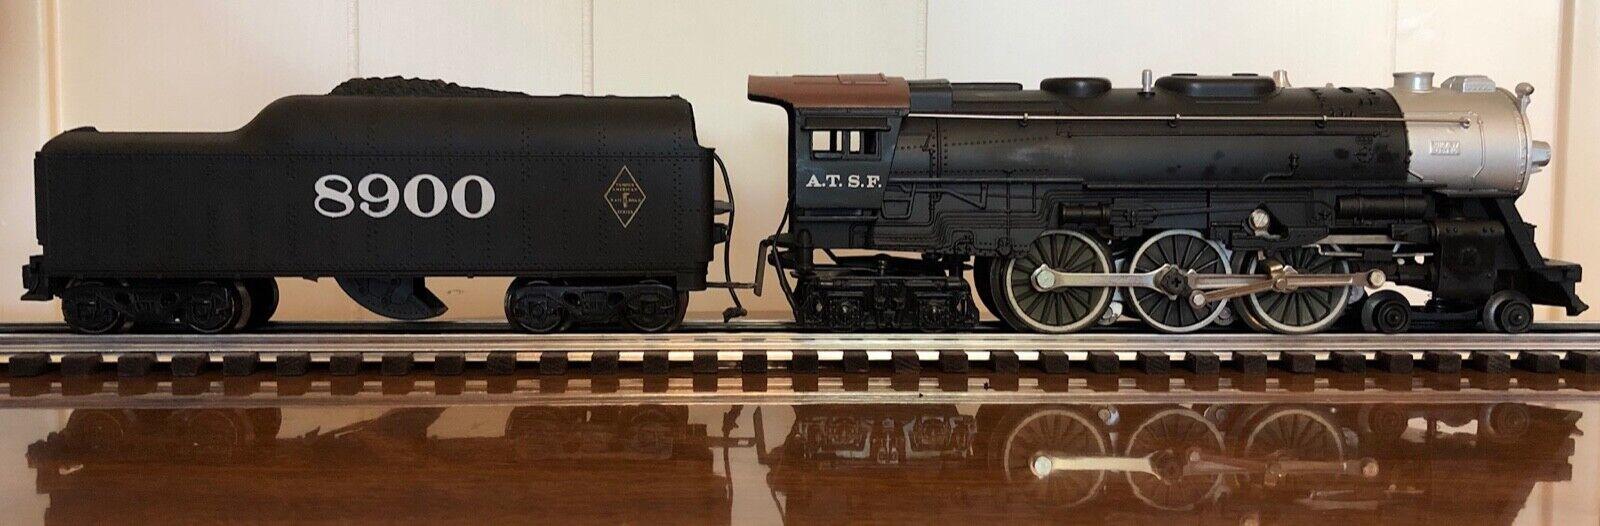 Lionel Famous American Railroad Series - Santa Fe 4-6-4 - Series